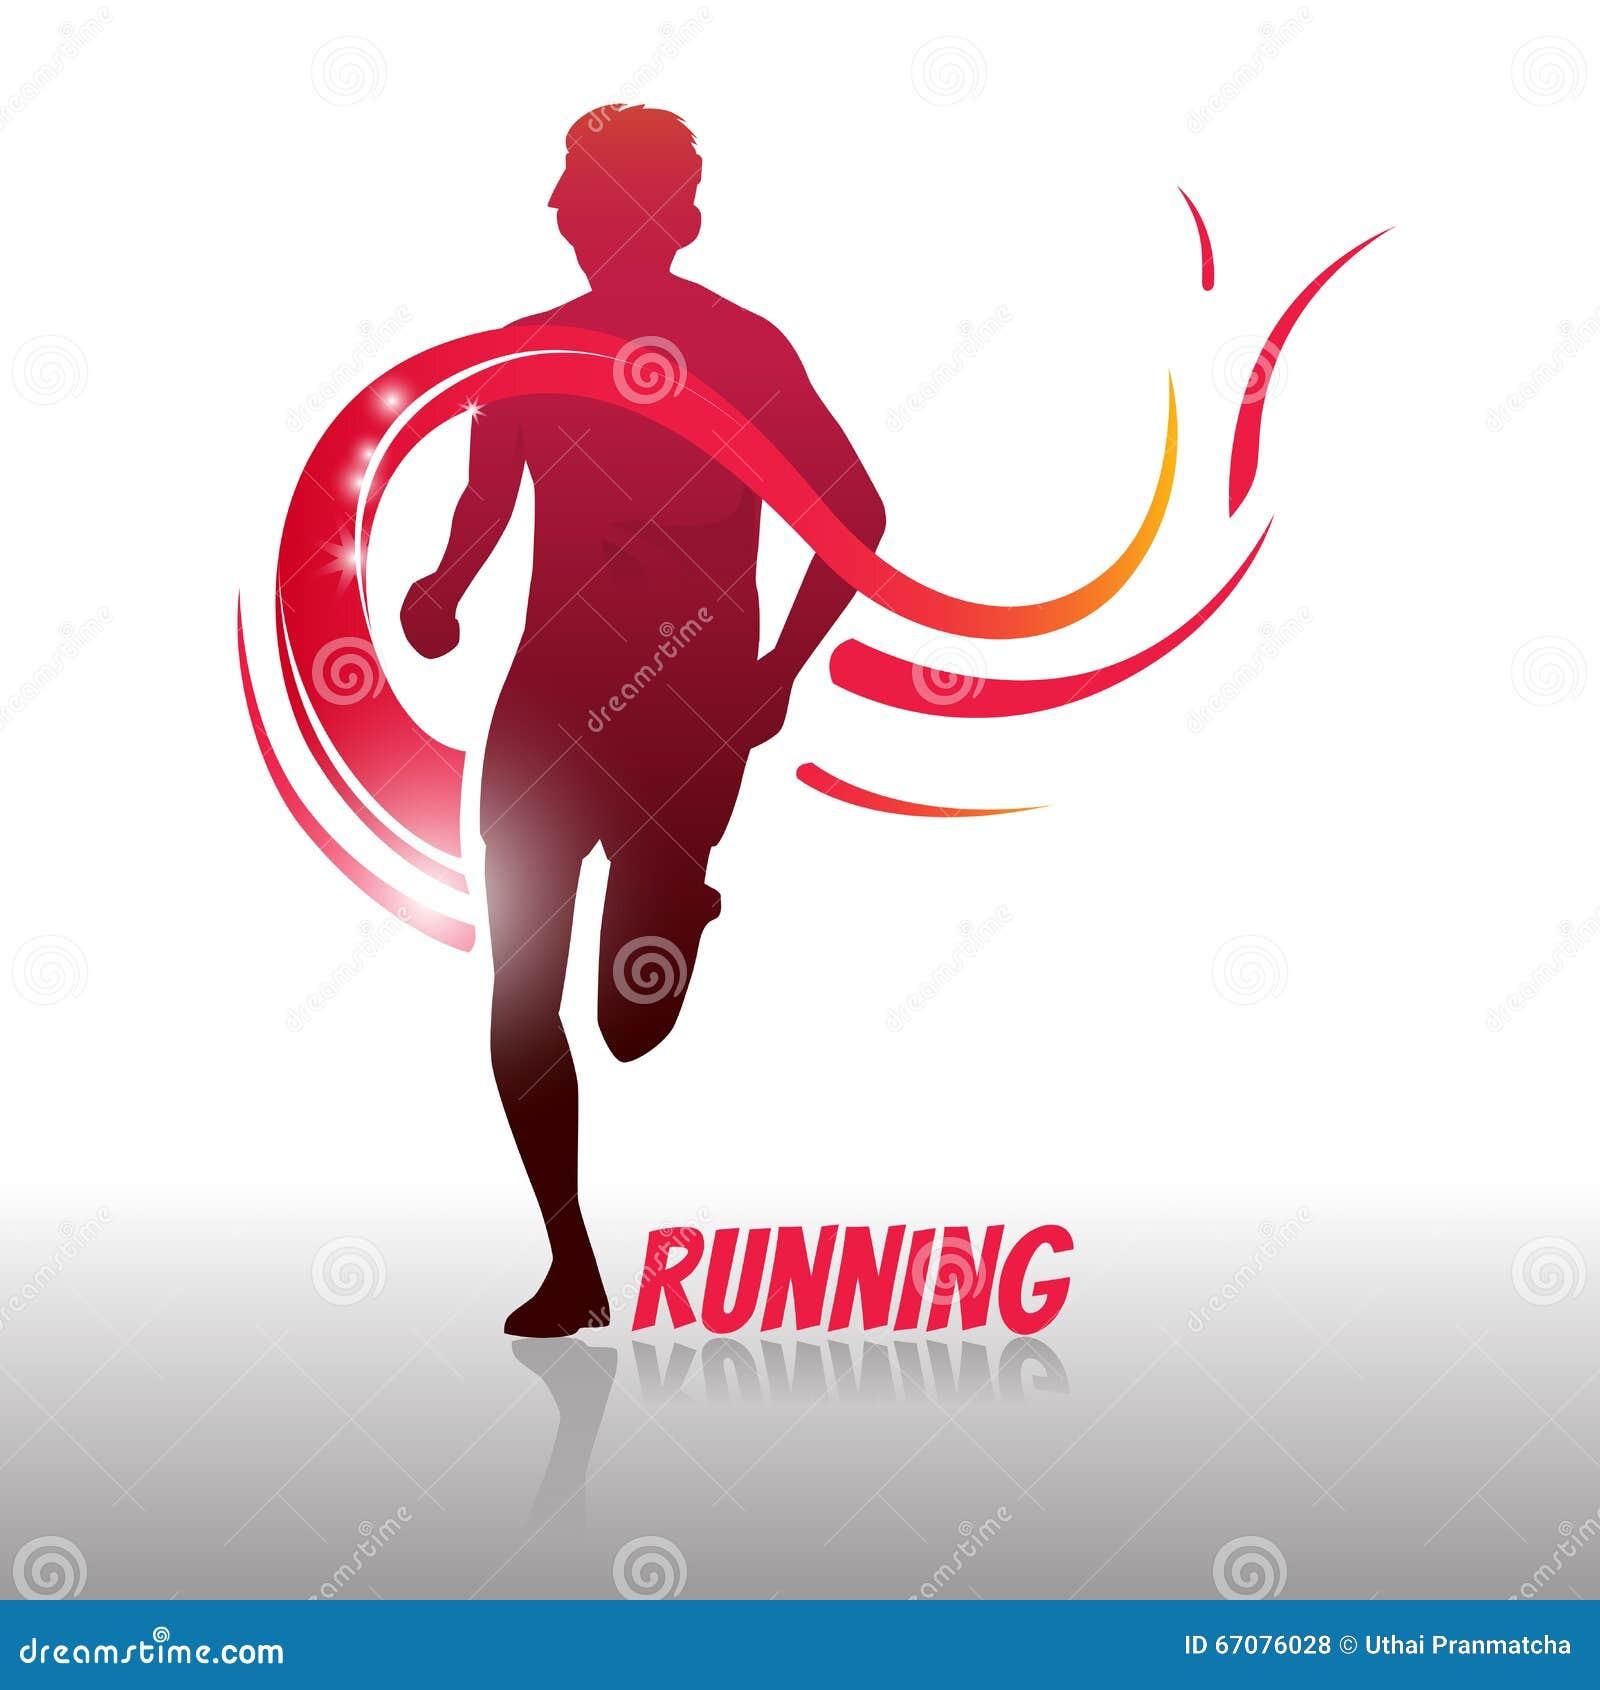 Running Man Logo And Symbol Stock Vector Image 67076028